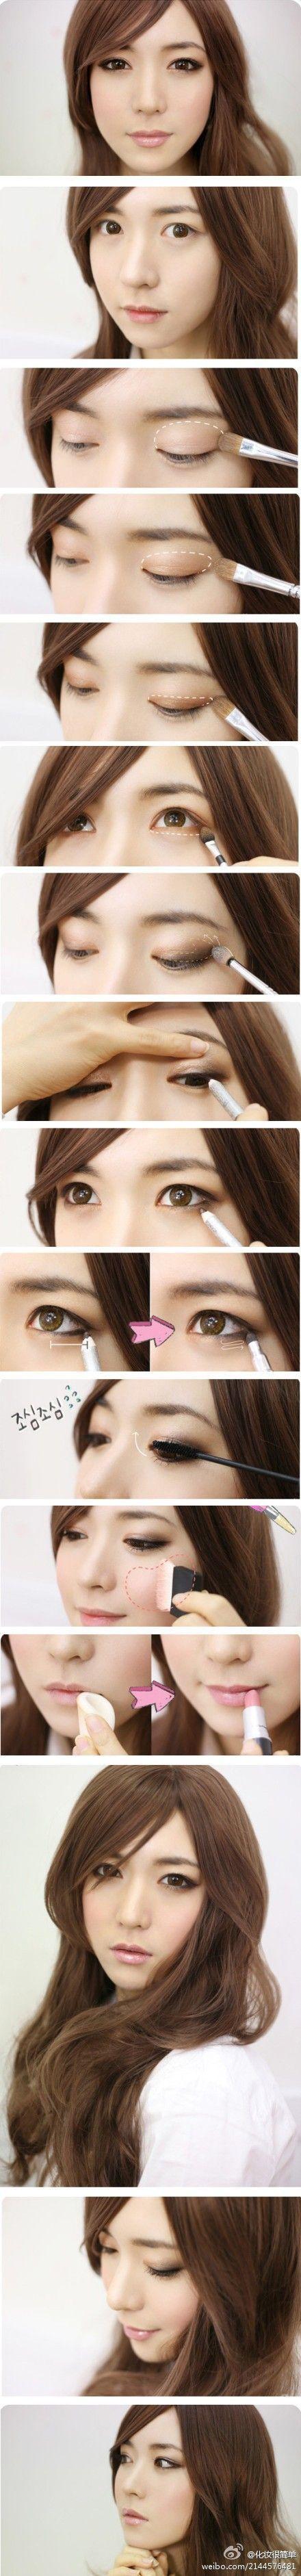 top-12-asian-eye-makeup-tutorials-for-bride-famous-fashion-wedding-design-idea (12)